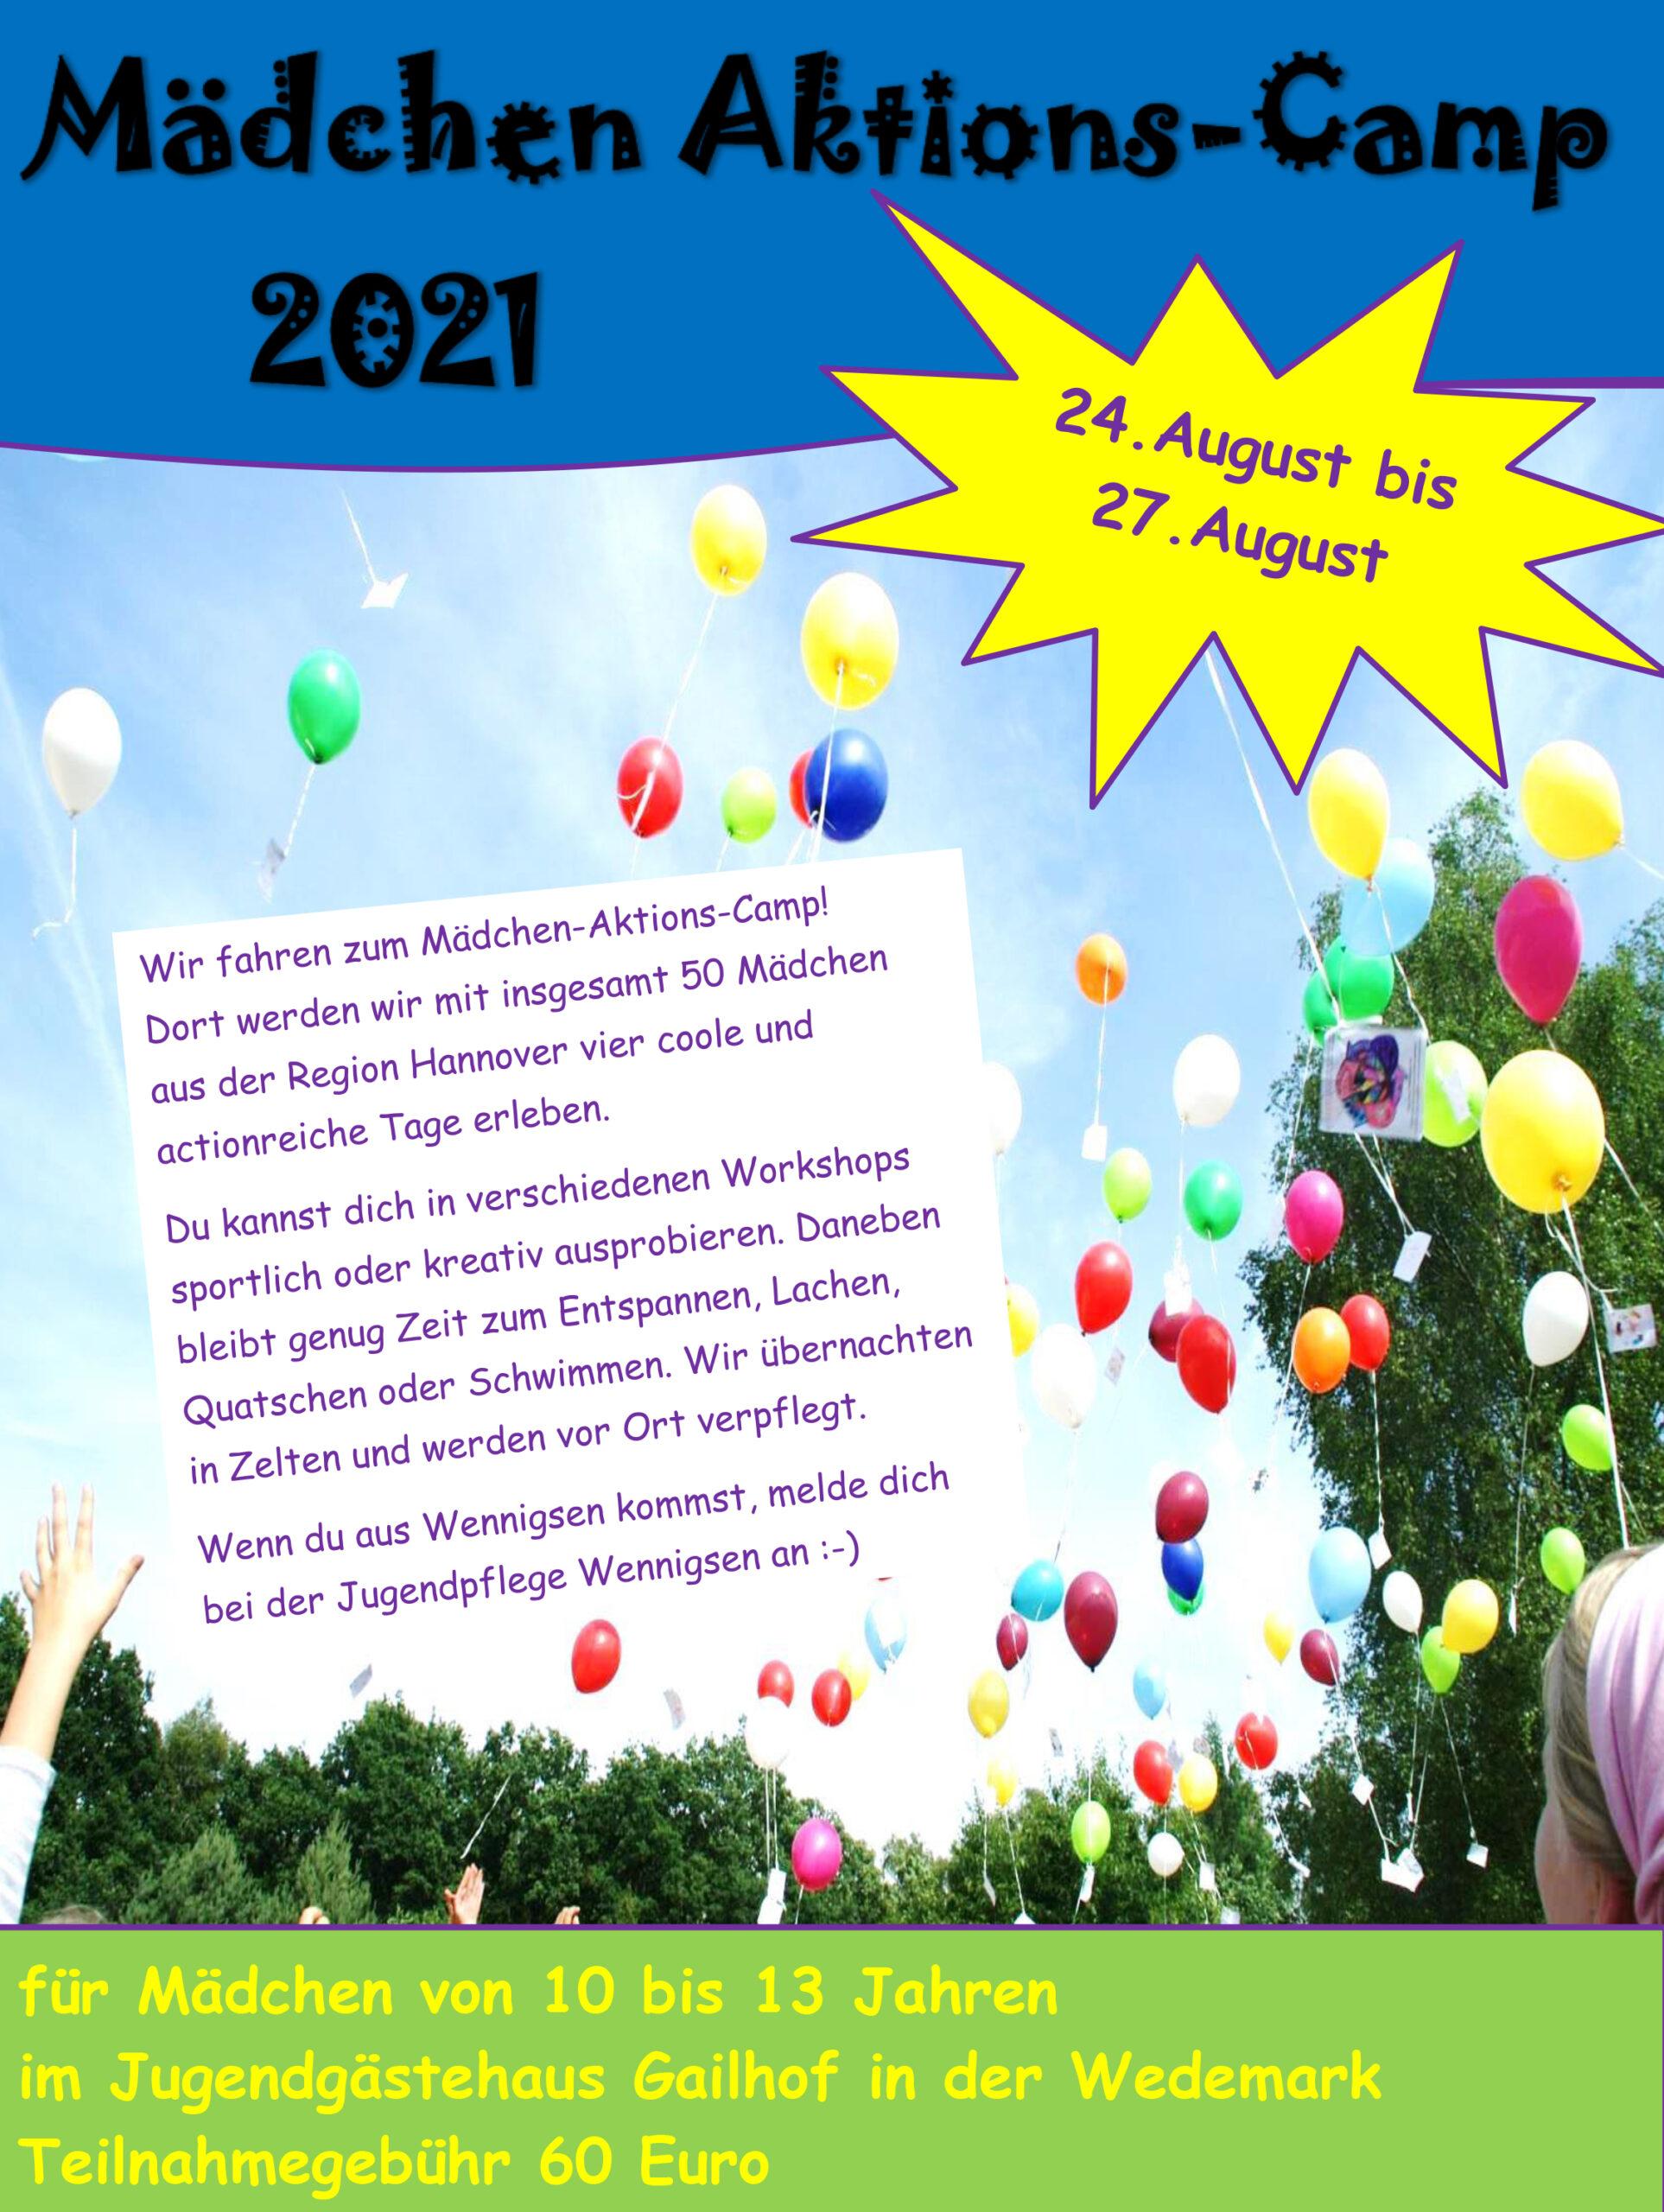 Mädchen-Aktions-Camp 2021